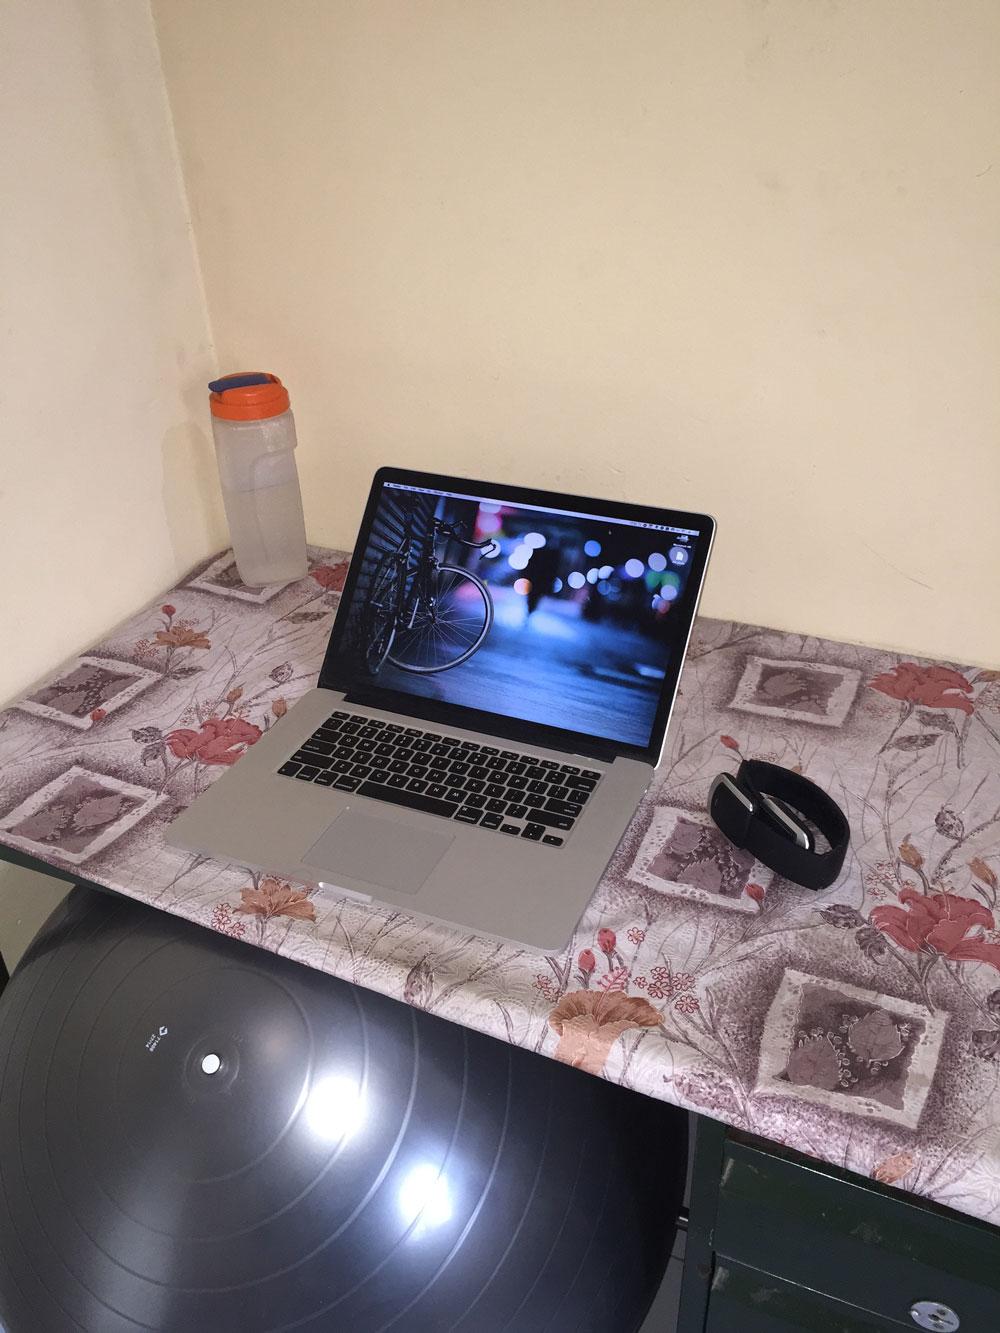 Saravanan's desk